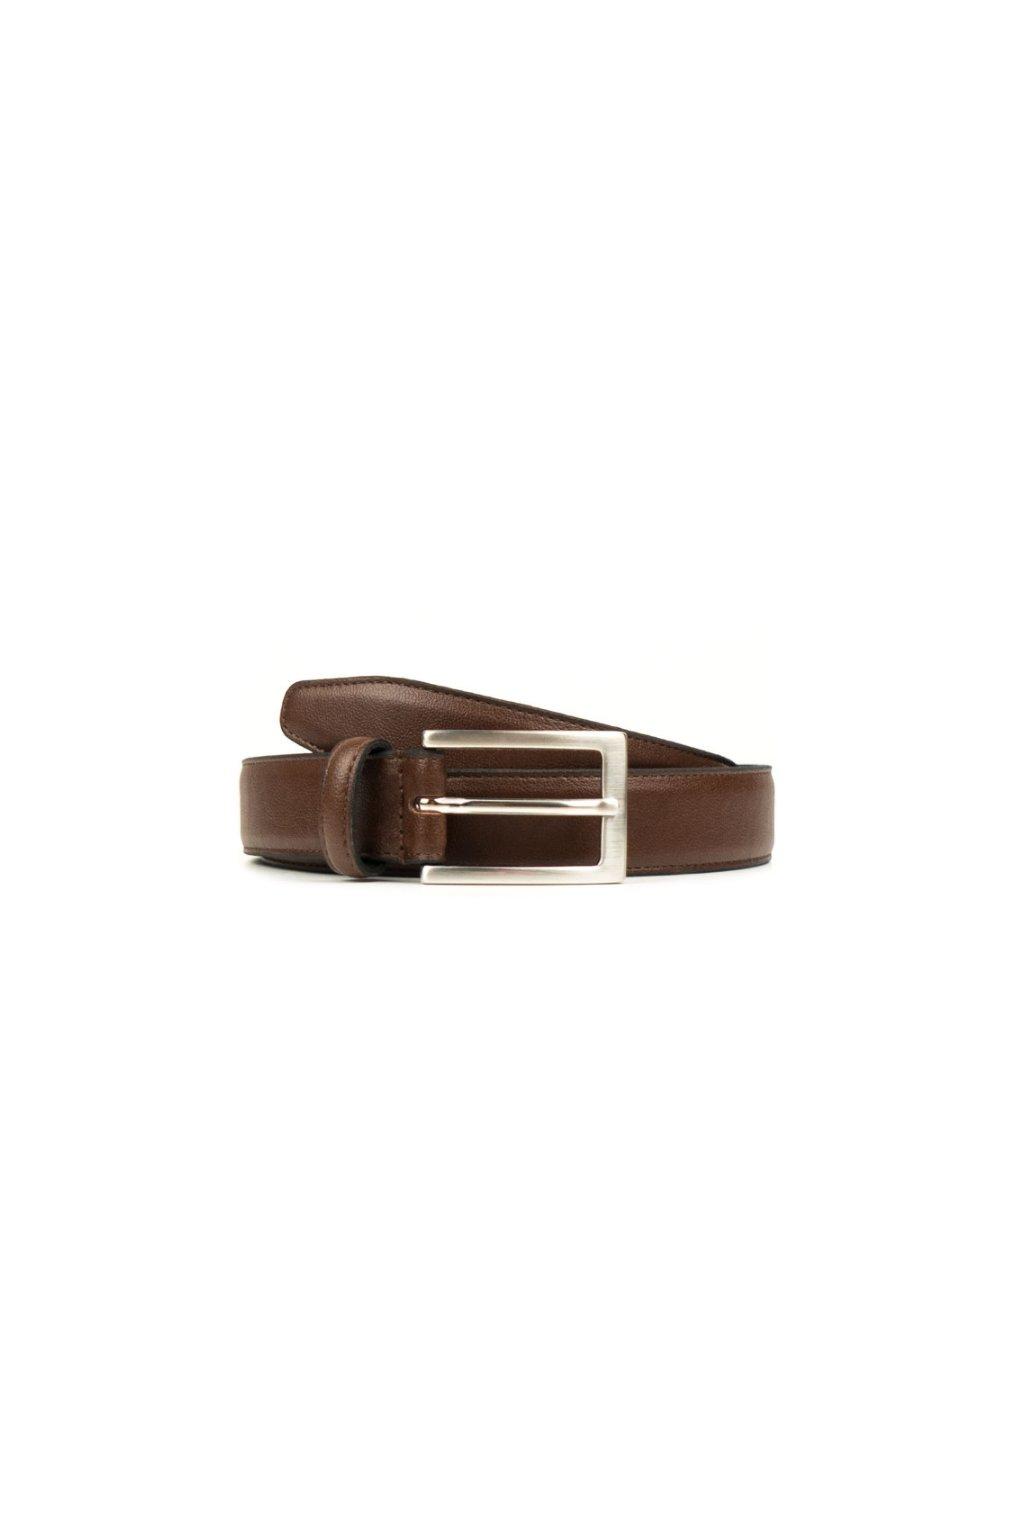 "Hnedý opasok ""Classic 3cm Belt Chestnut"""